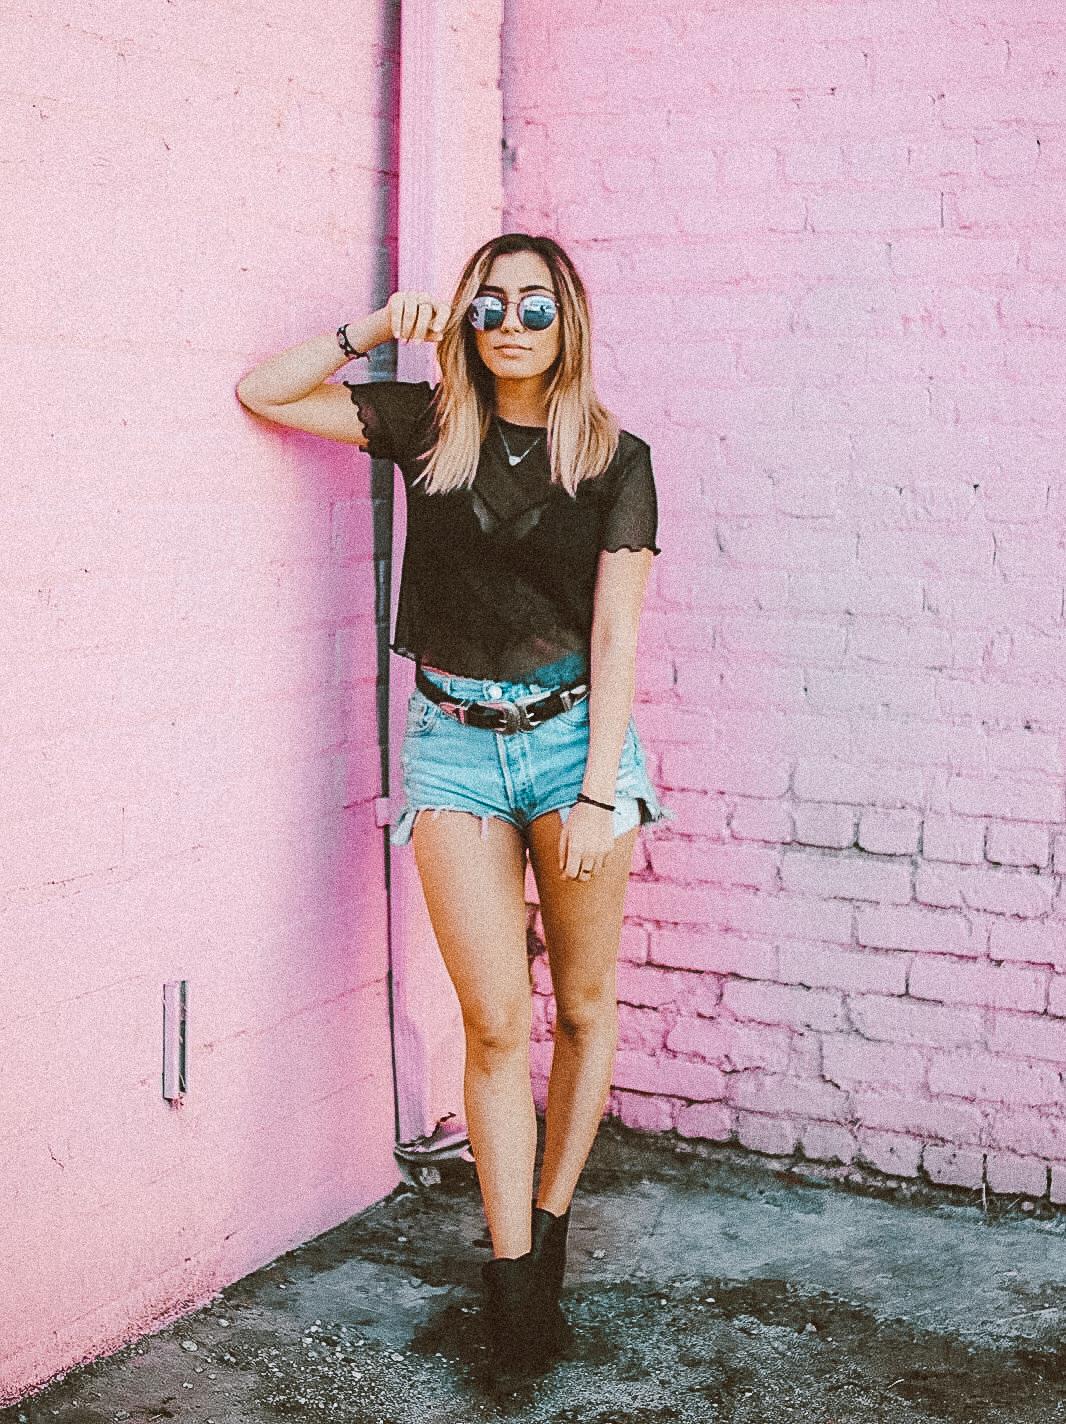 Instagram Worthy Walls Tara Michelle